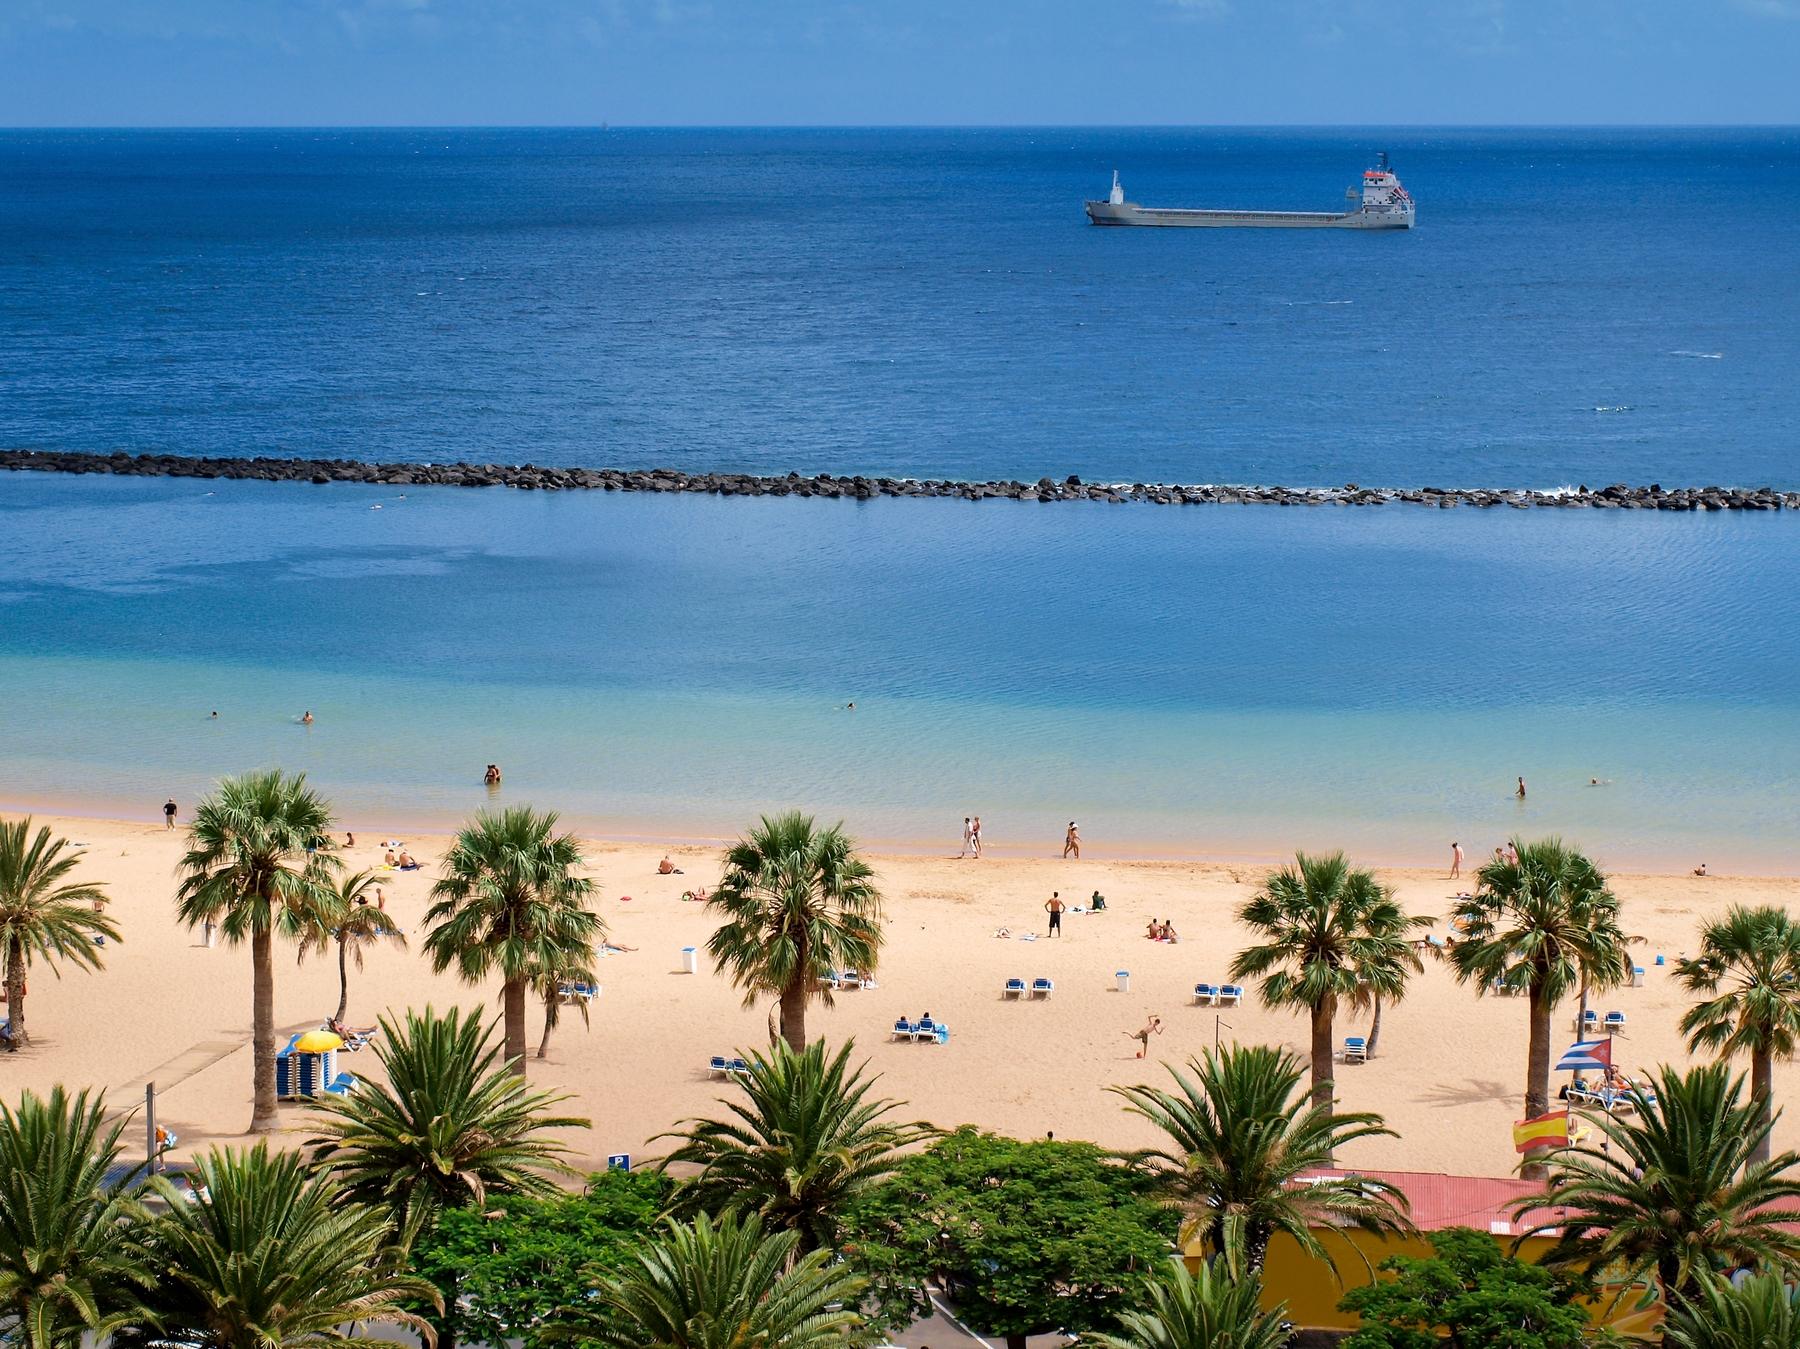 Beach in Tenerife -